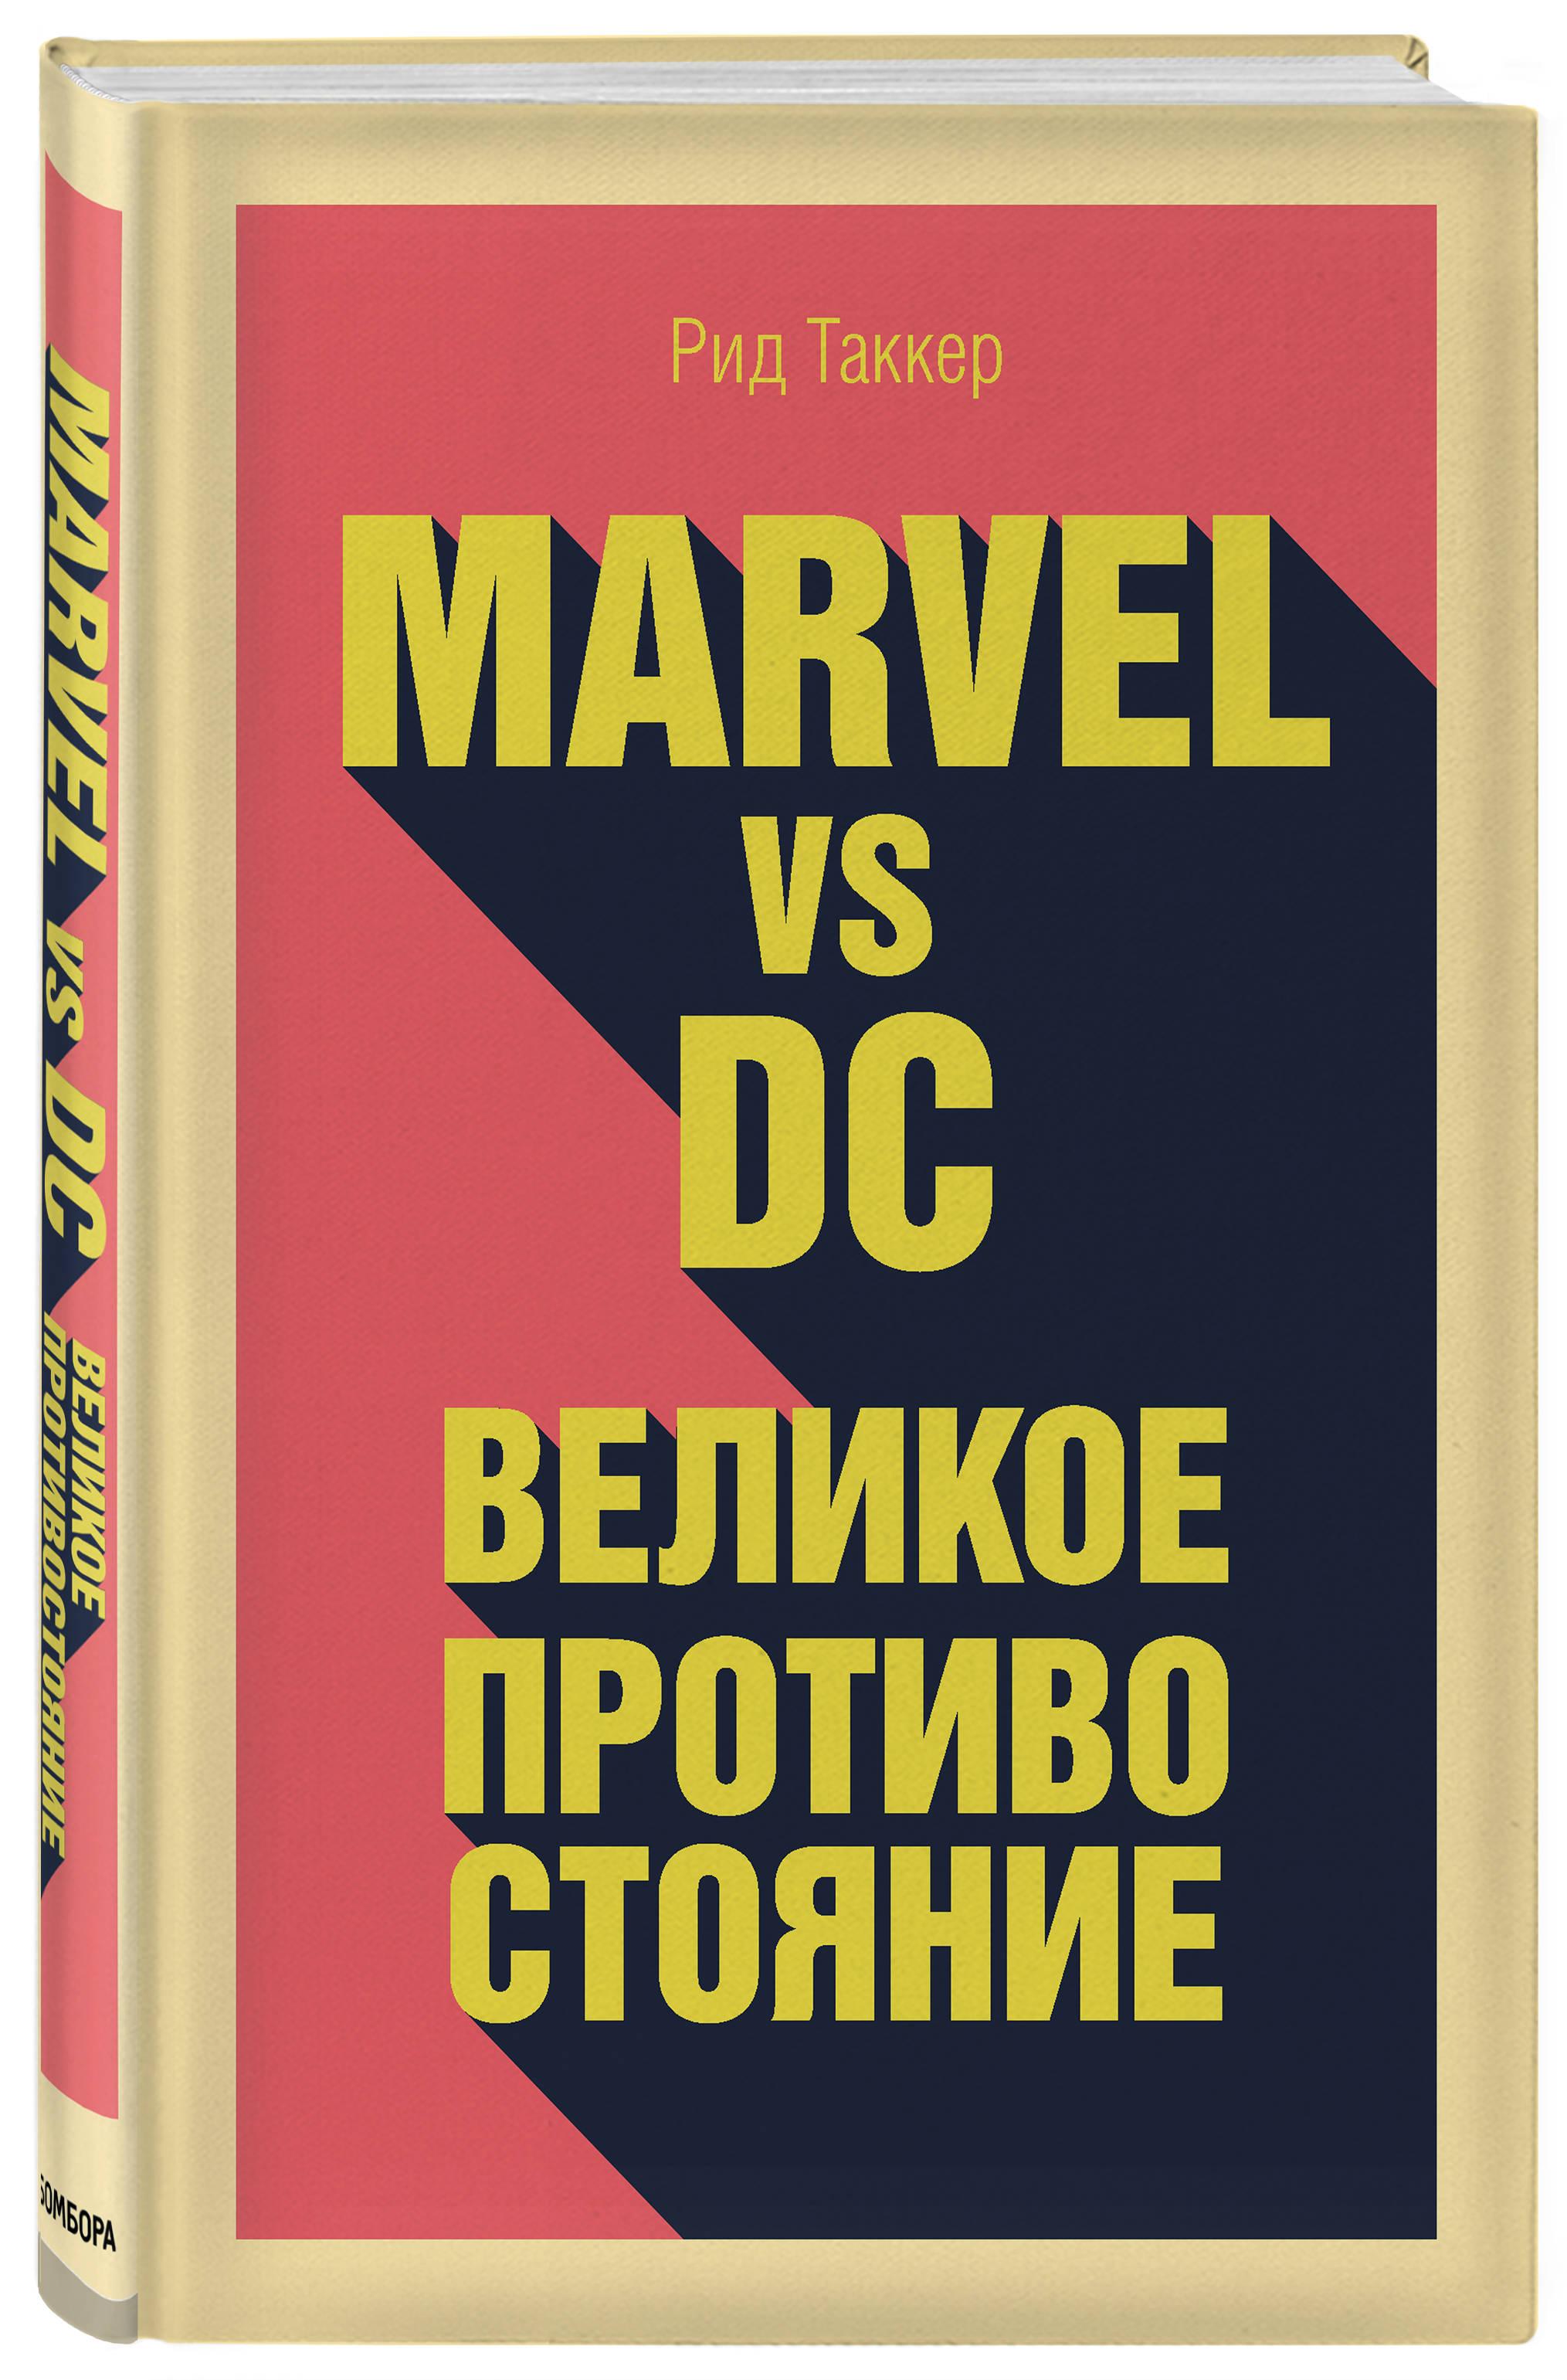 Фото - Таккер Р. Marvel vs DC. Великое противостояние двух вселенных таккер р marvel vs dc великое противостояние двух вселенных